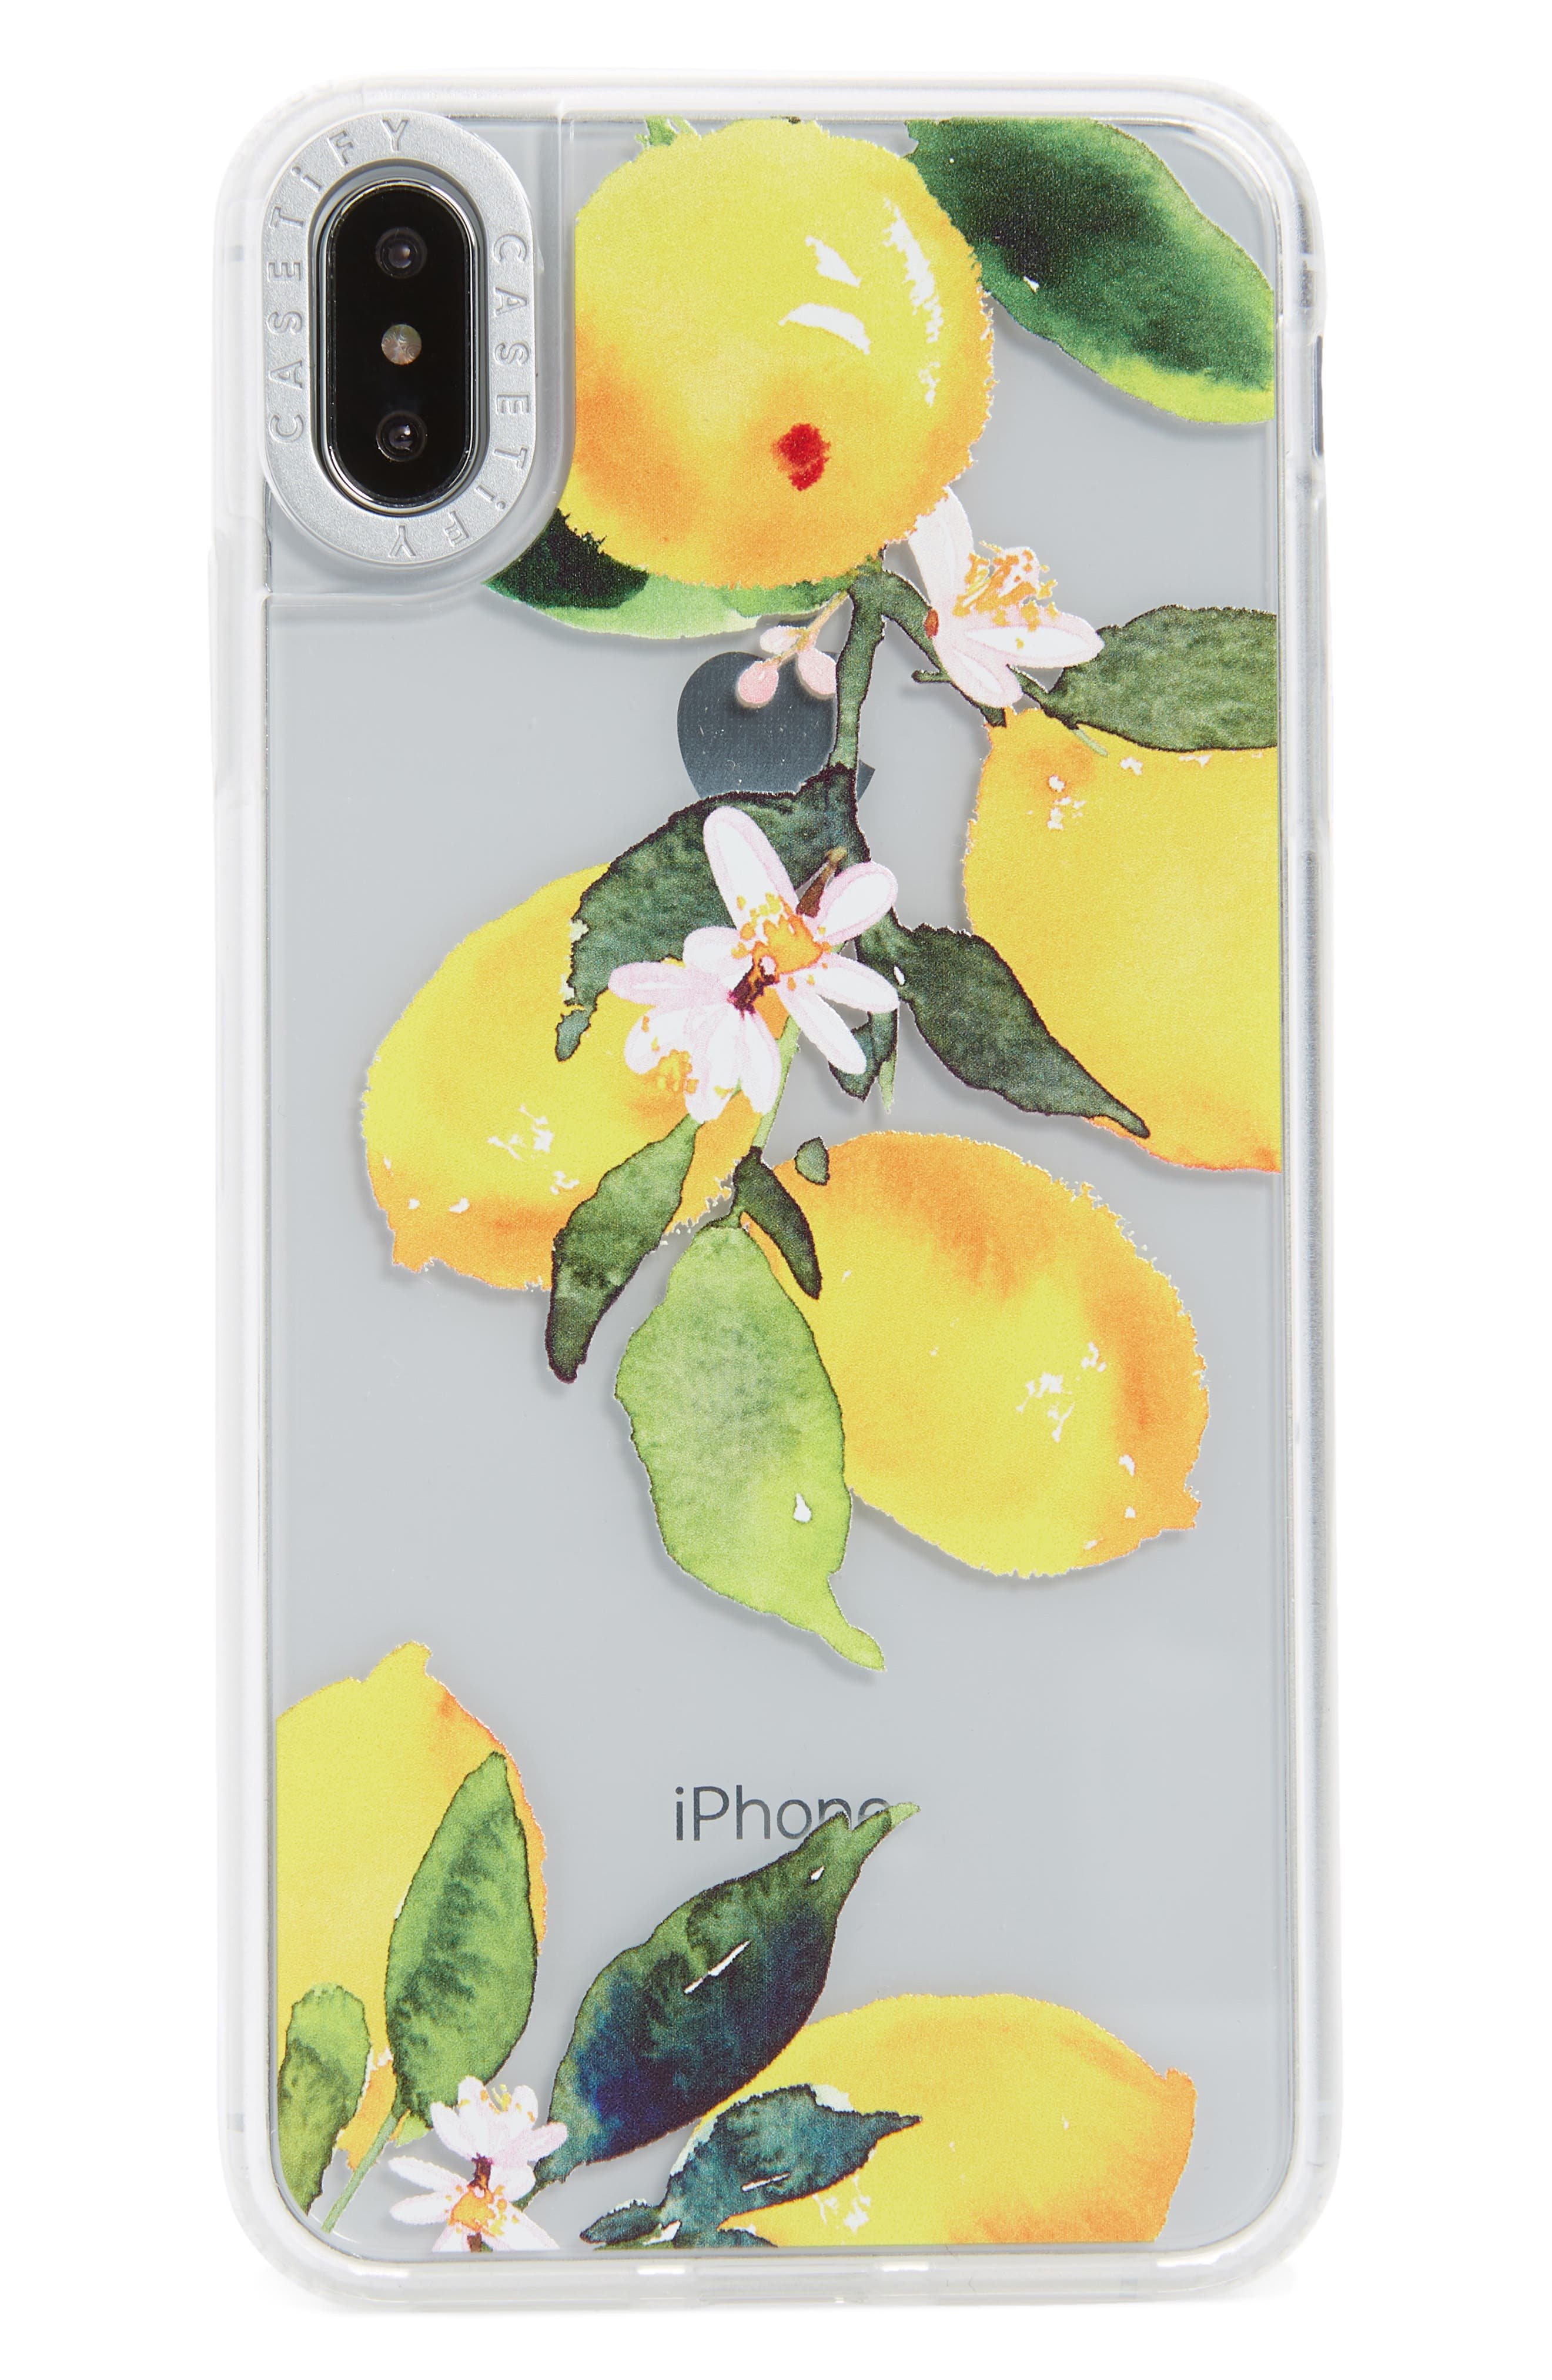 Watercolor Lemon Clear Grip iPhone X/Xs, XR & X Max Case,                             Main thumbnail 1, color,                             YELLOW/ GREEN